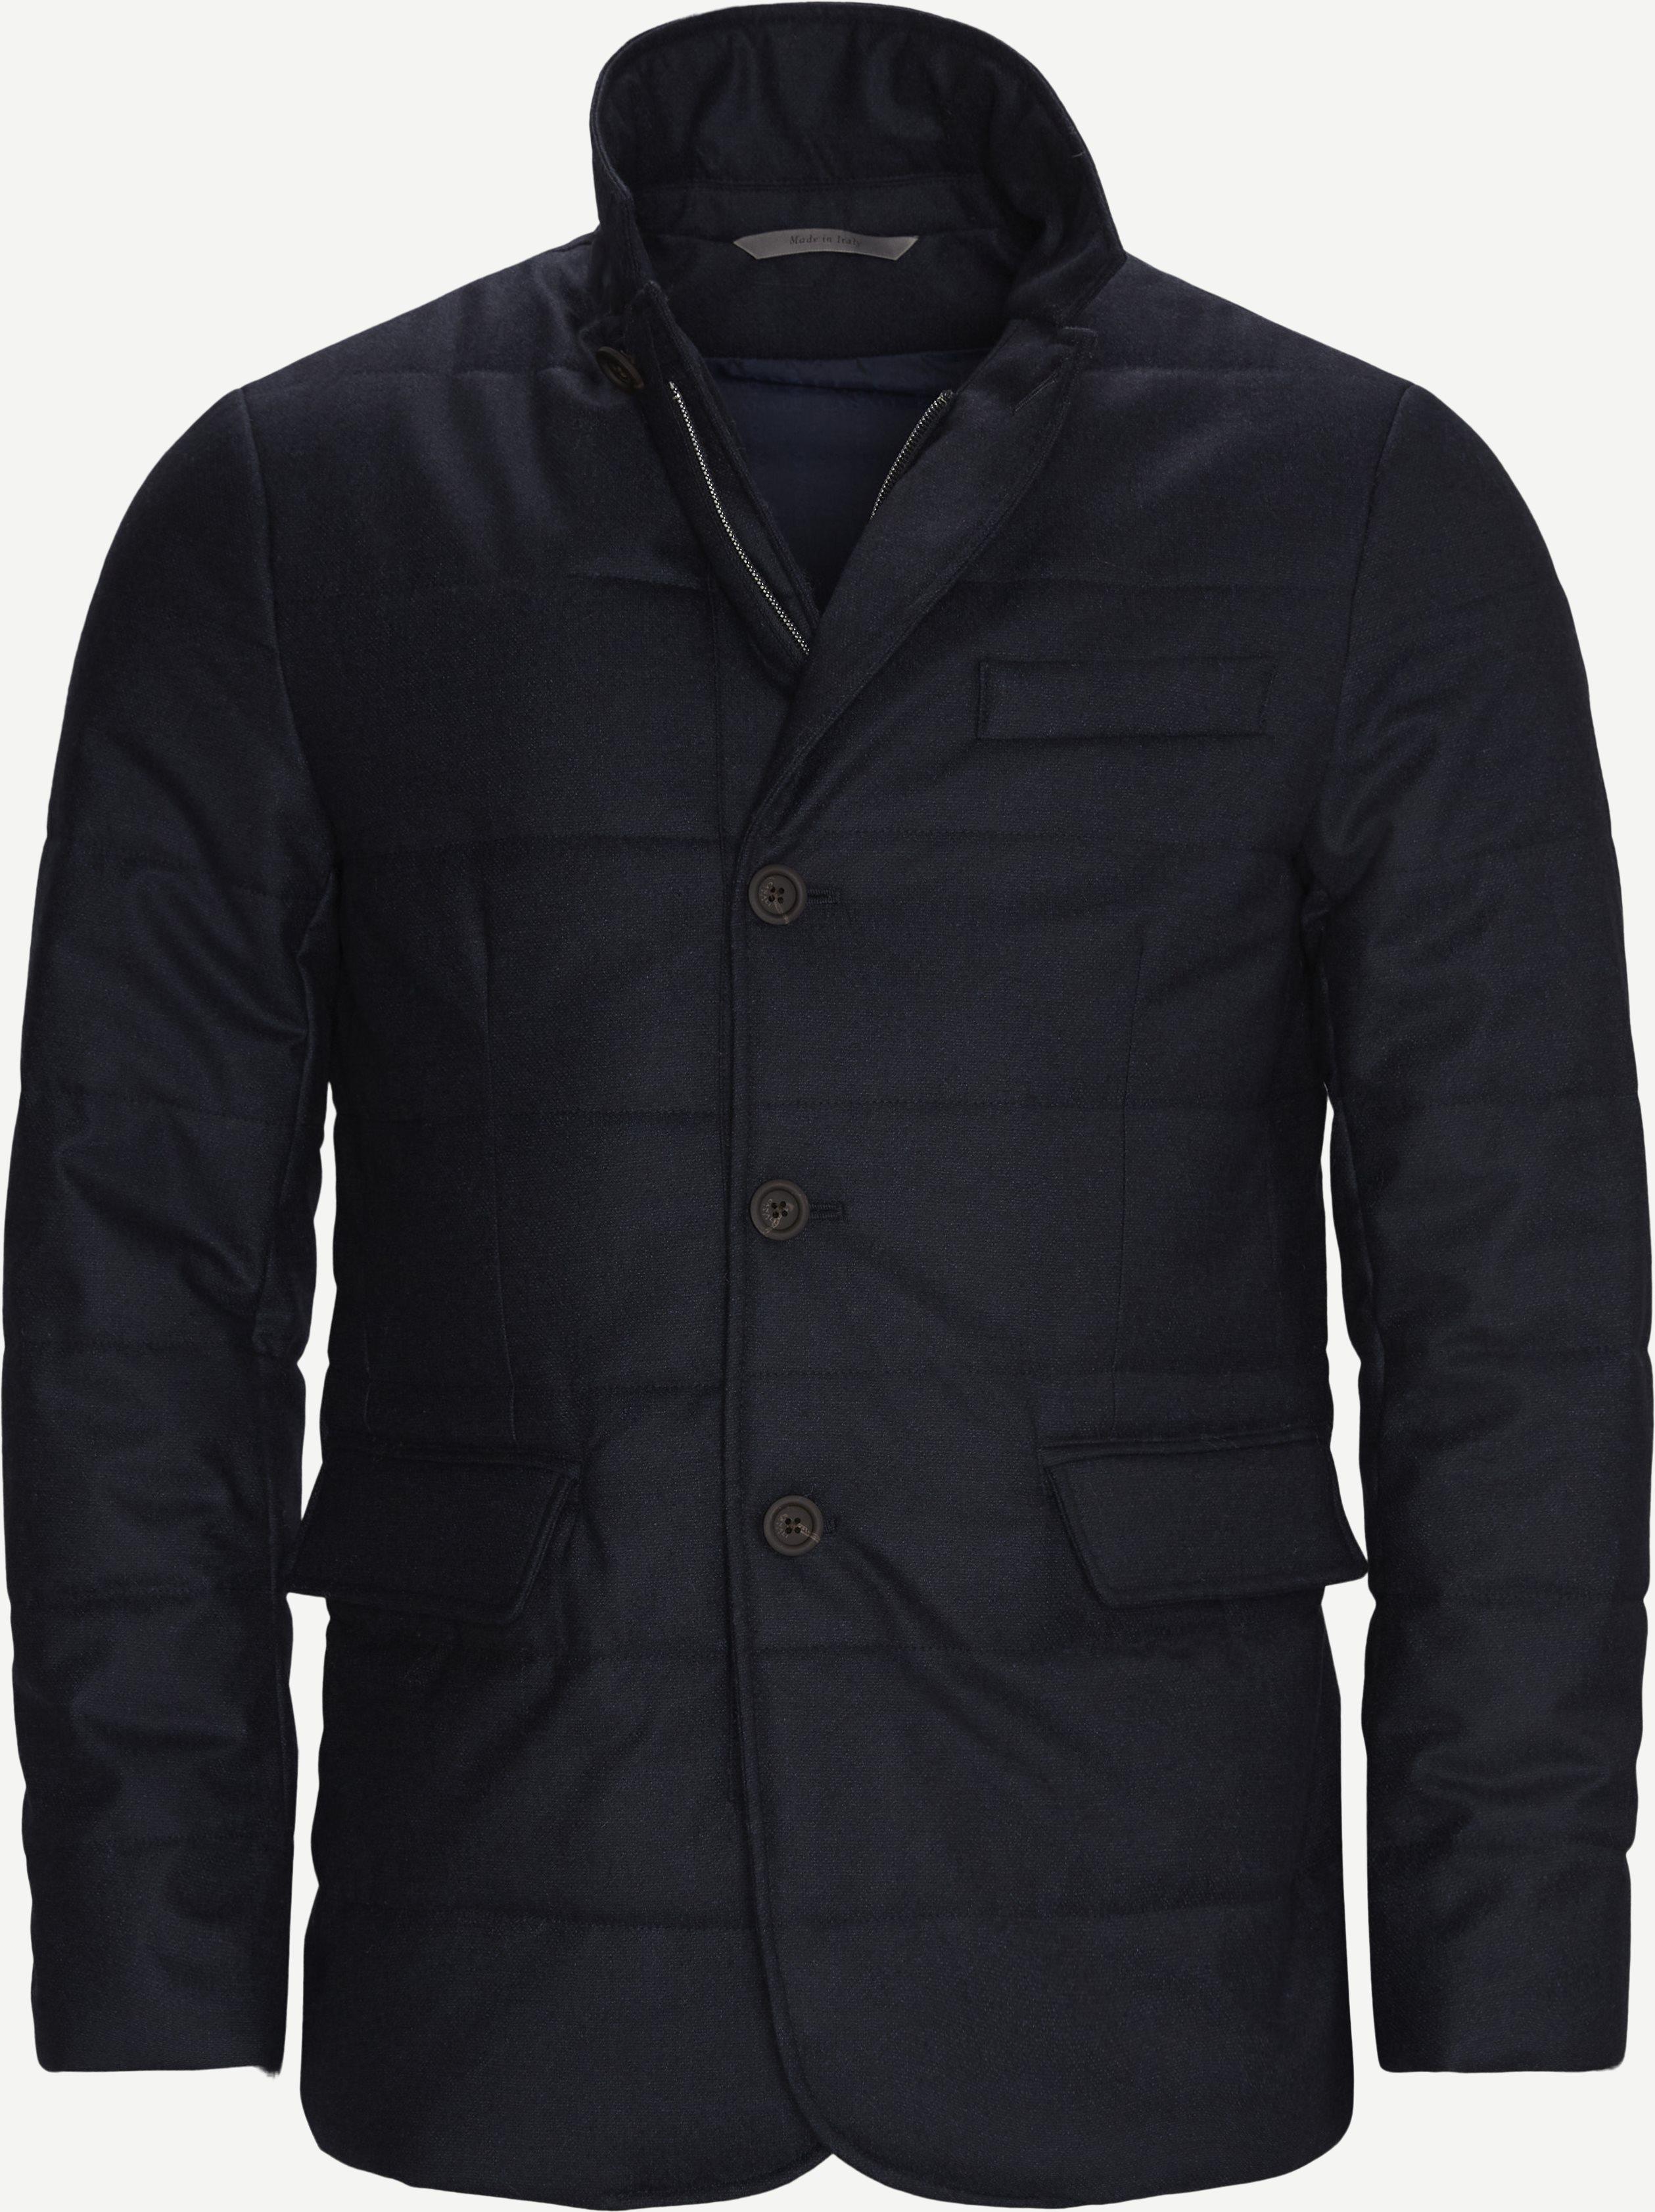 Jackets - Blue